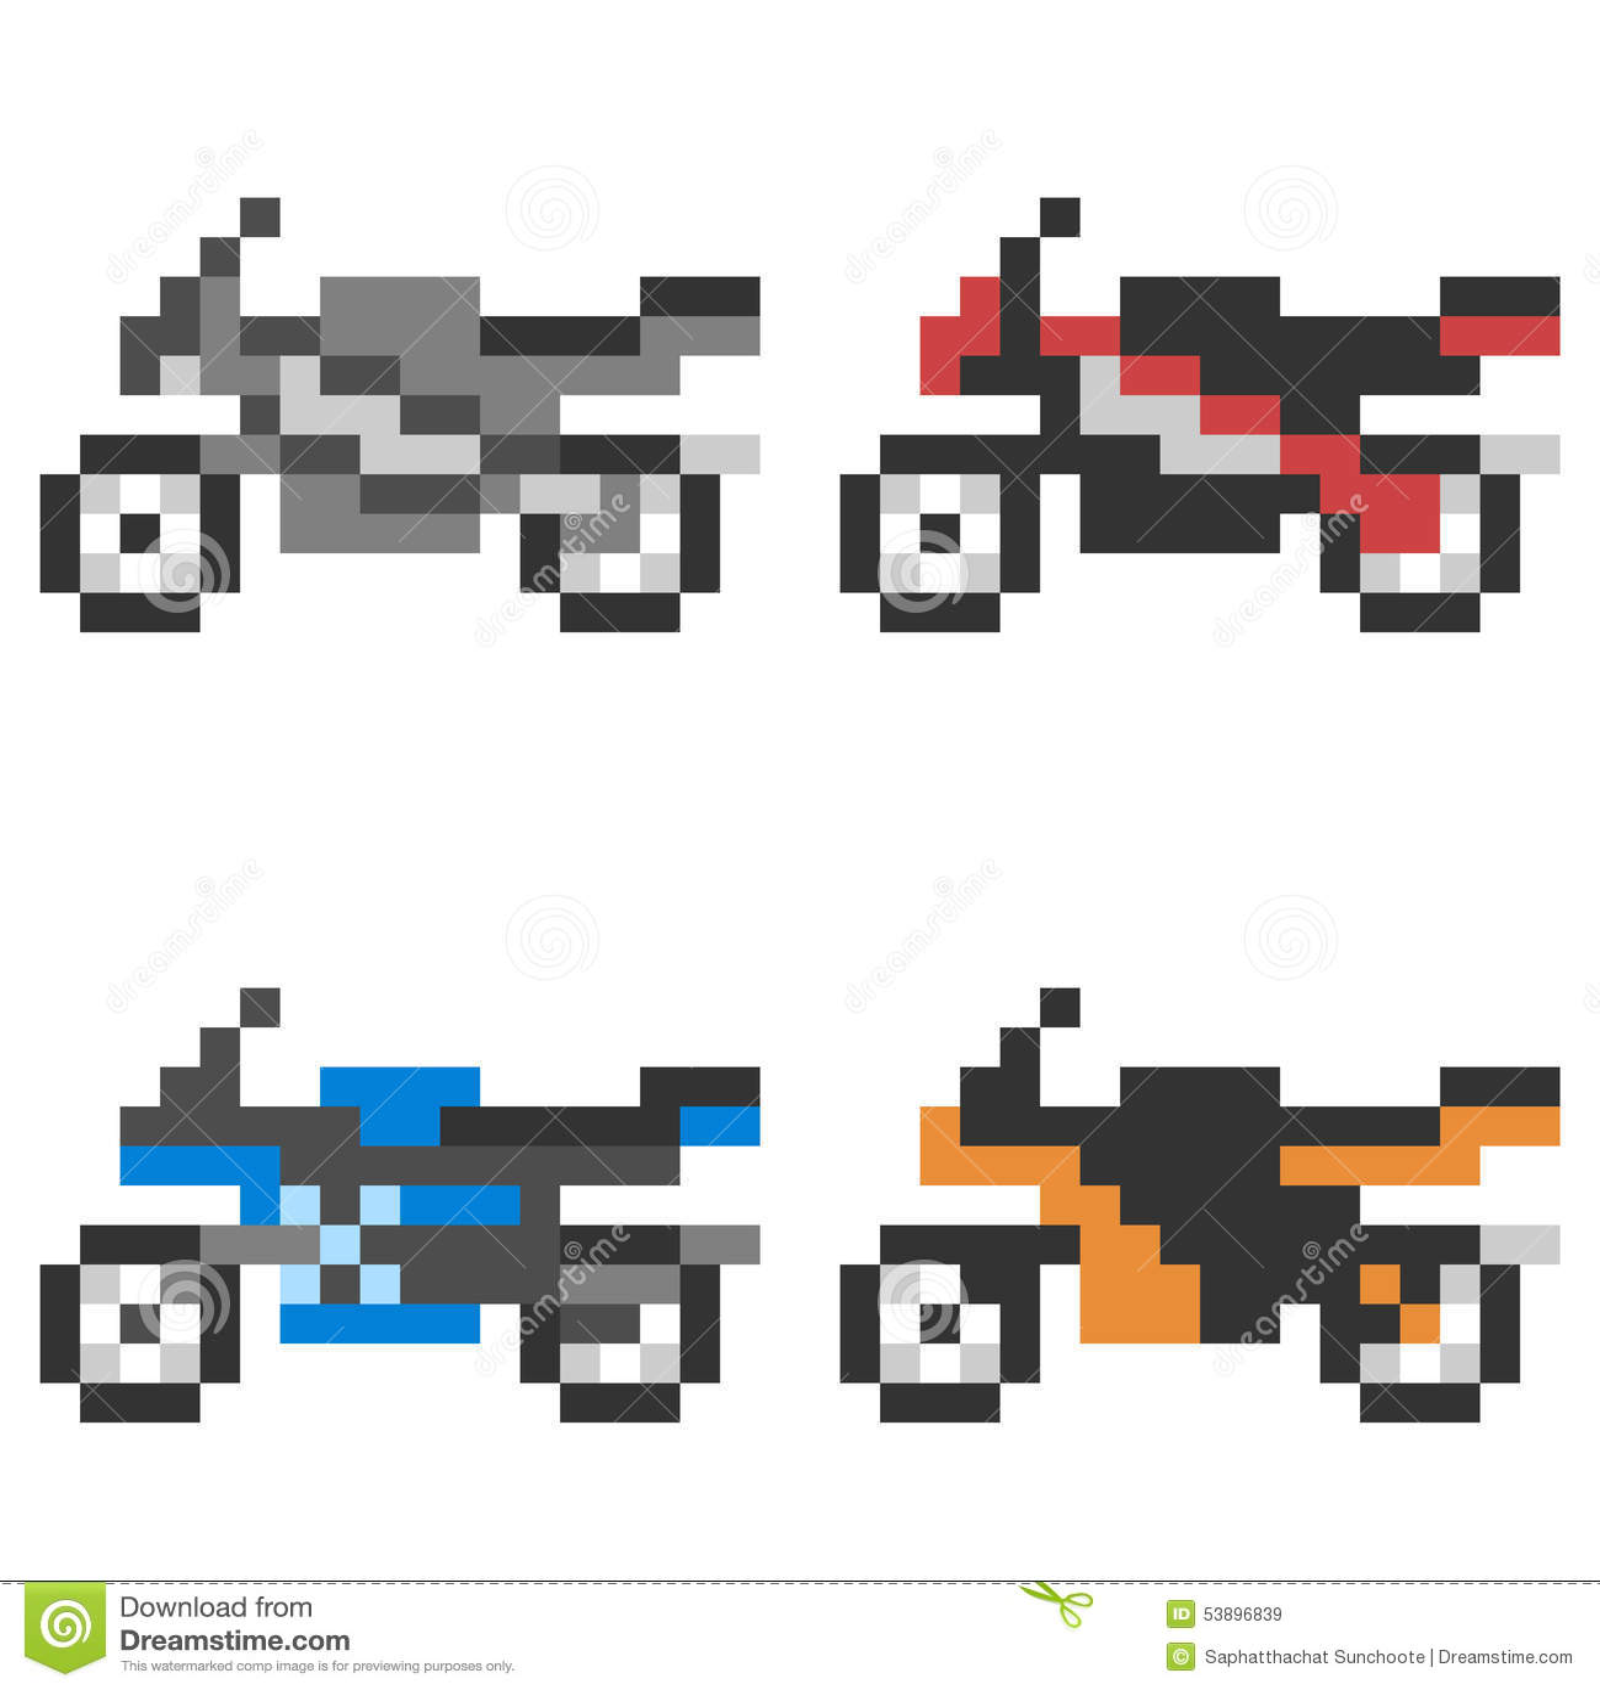 Illustration Pixel Art Icon Motorcycle Stock Vector - Illustration of square, motorcycle: 53896839